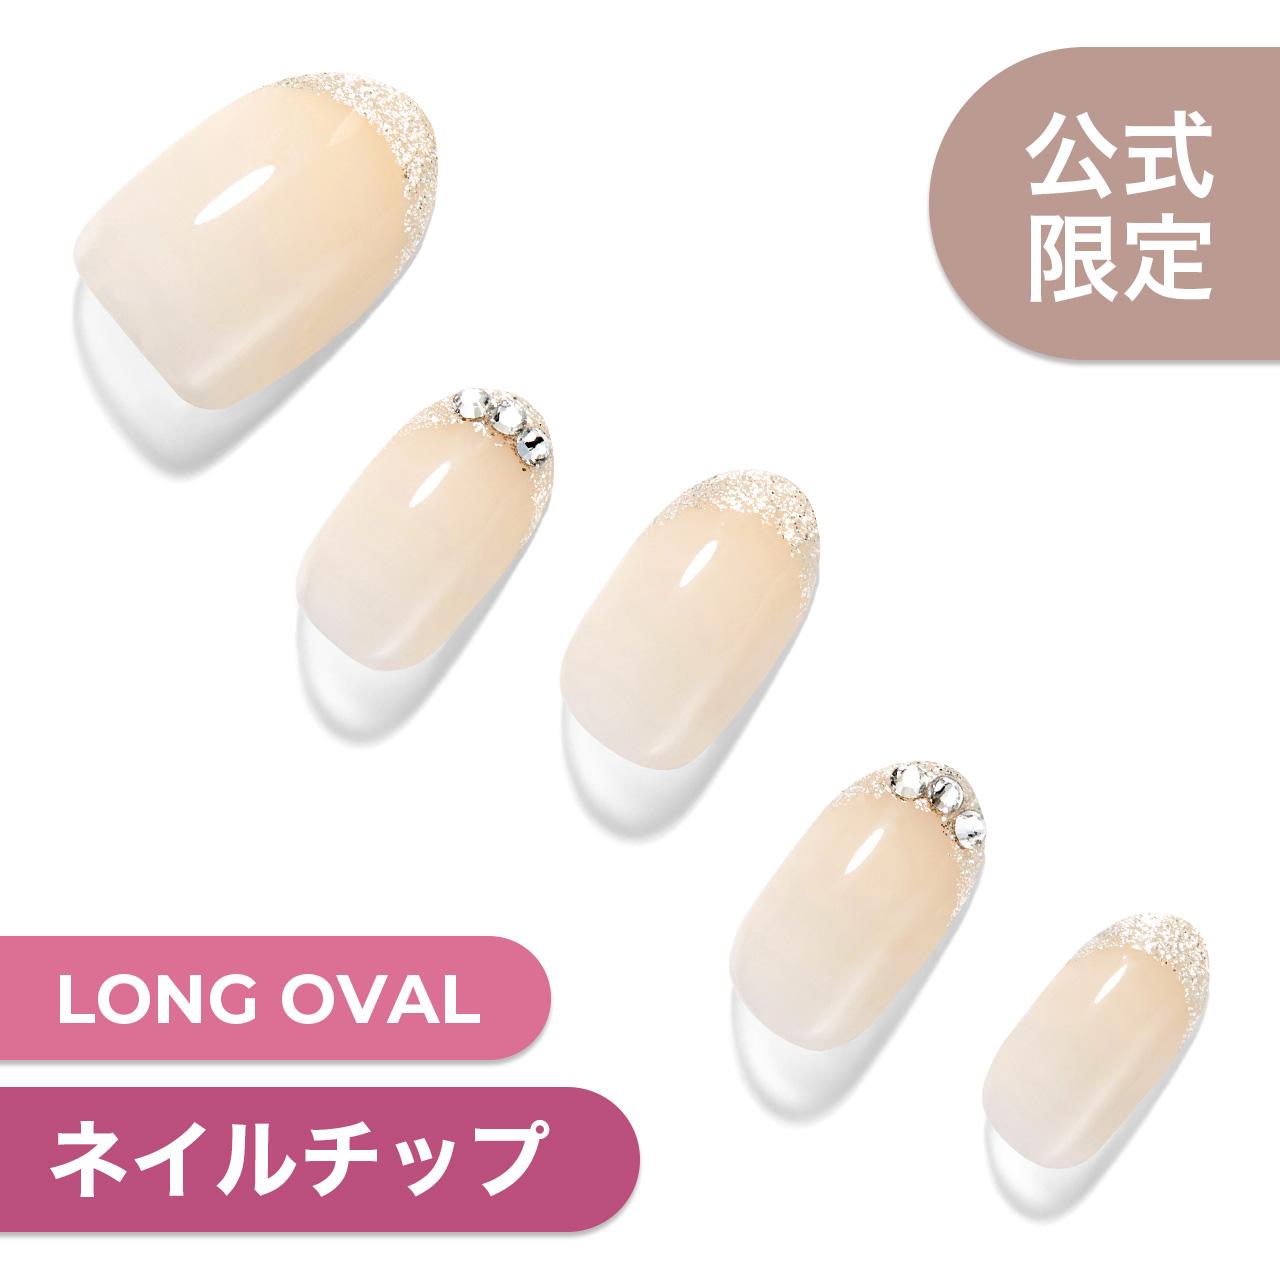 【Wedding Ring】ダッシングディバマジックプレス